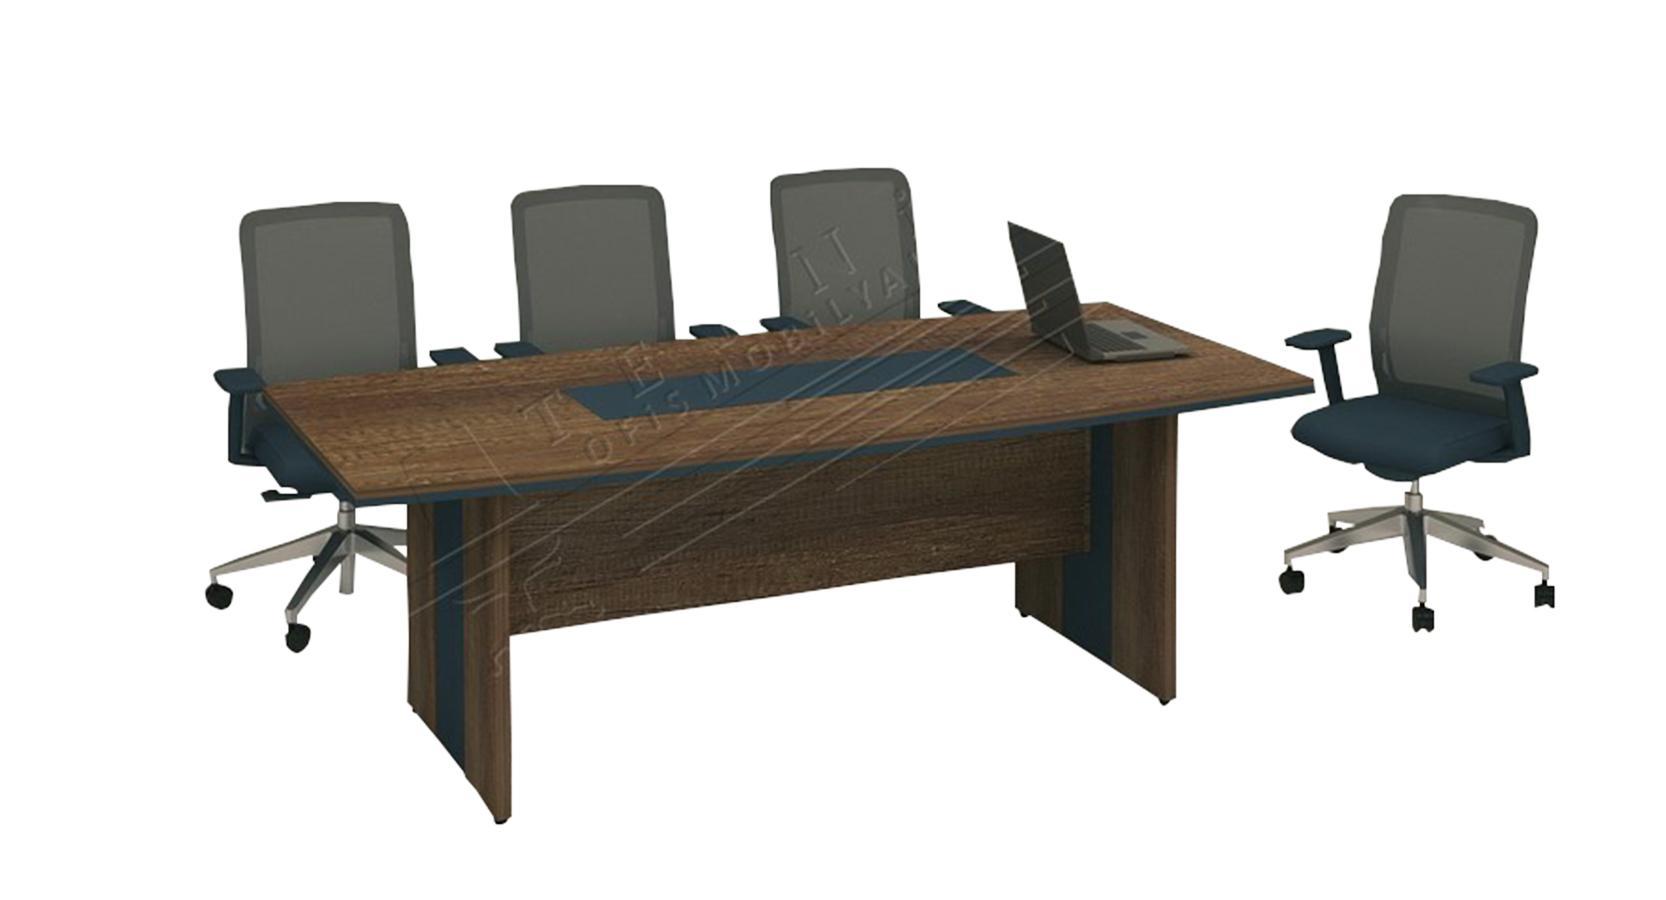 karan iş yeri toplantı masası 260cm